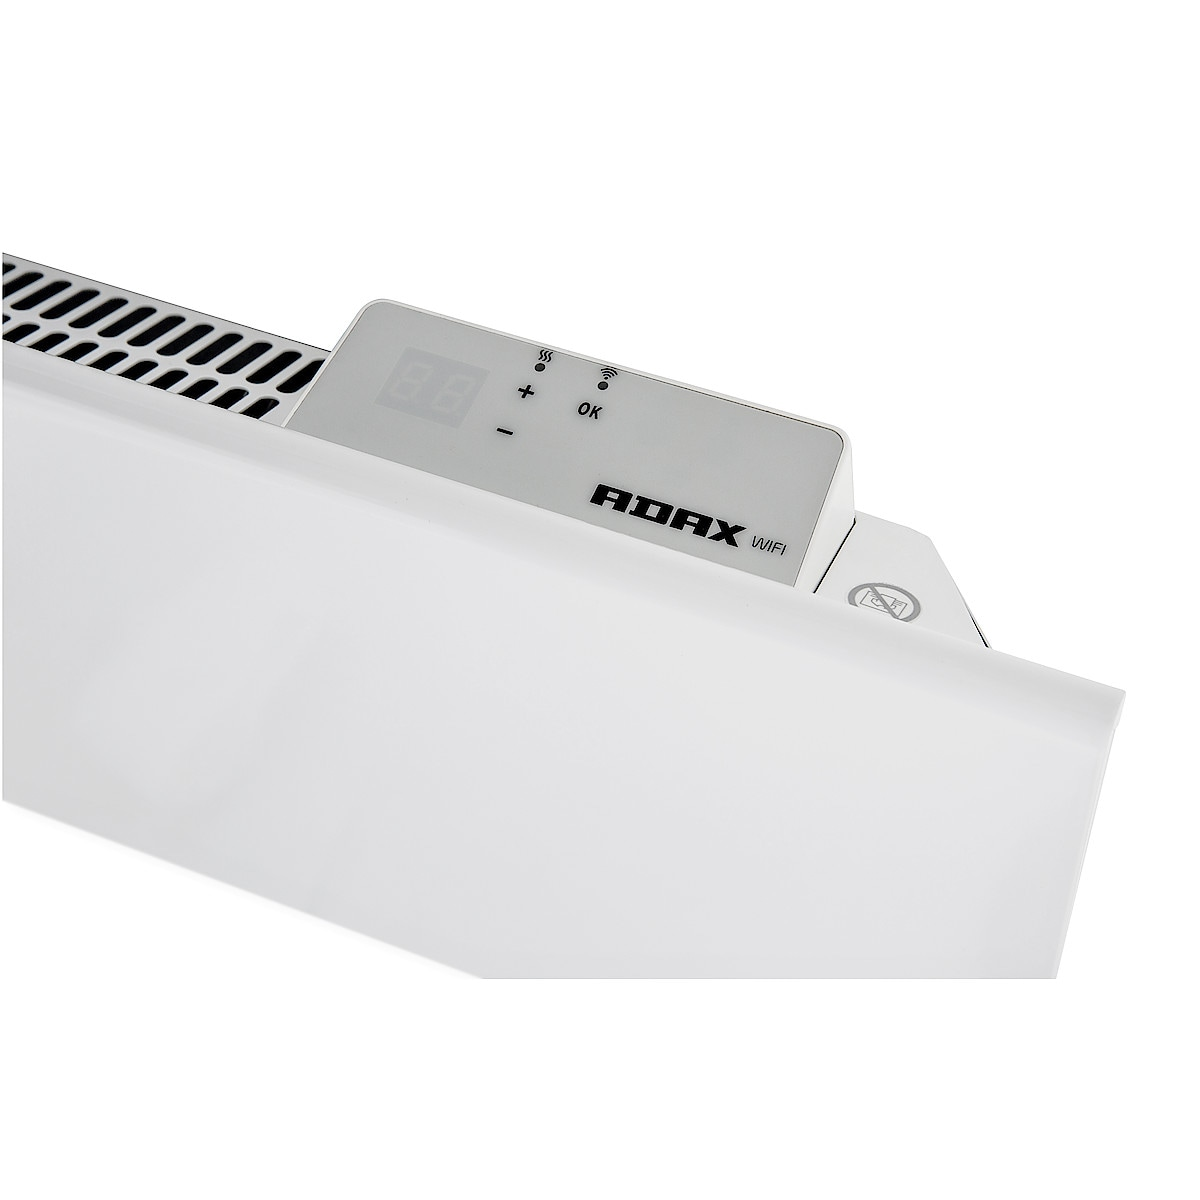 Element med WiFi 800 W 400 V Adax Neo H08KWT